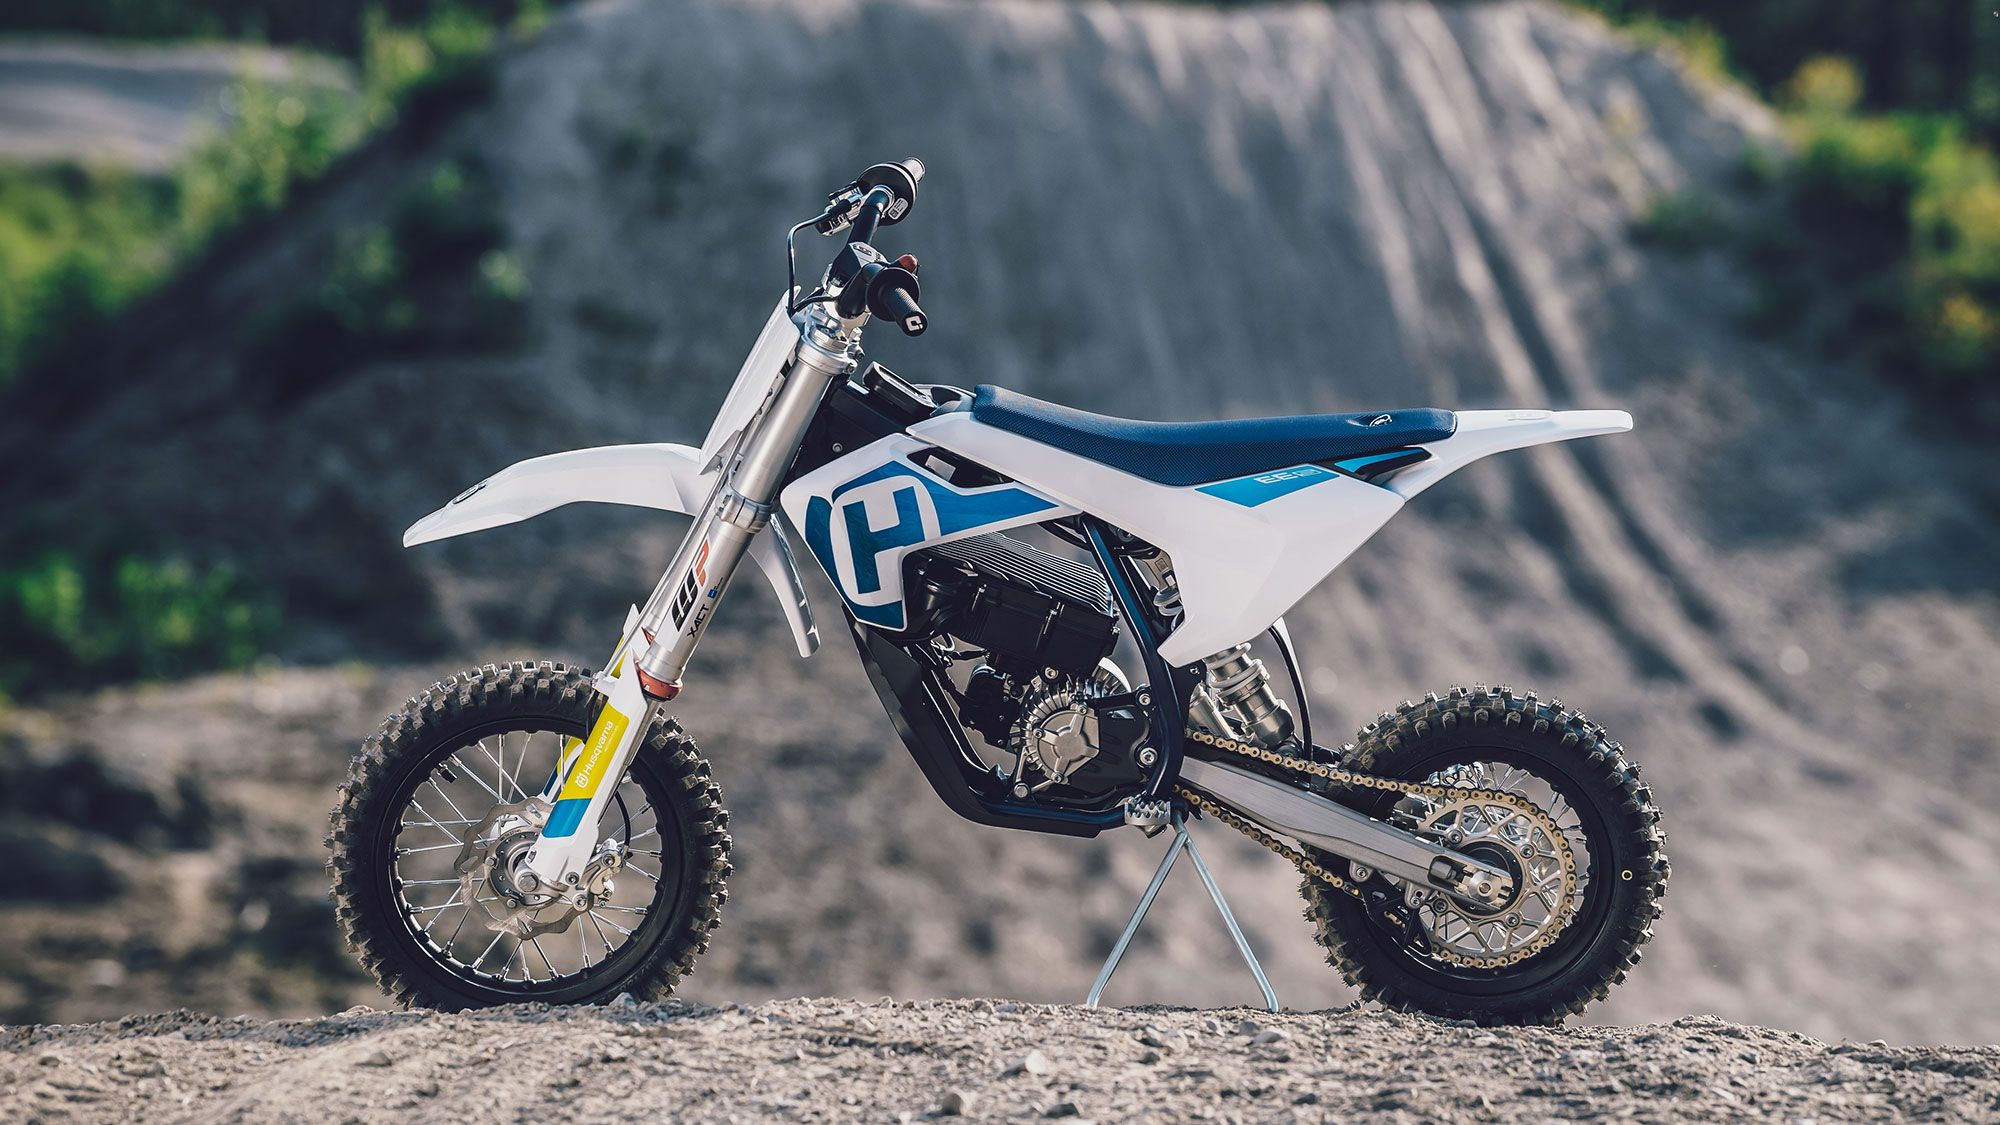 2020 Husqvarna Ee 5 Electric Dirt Bike Motorcycles For Sale Yamaha Motorcycles For Sale Motorcycle